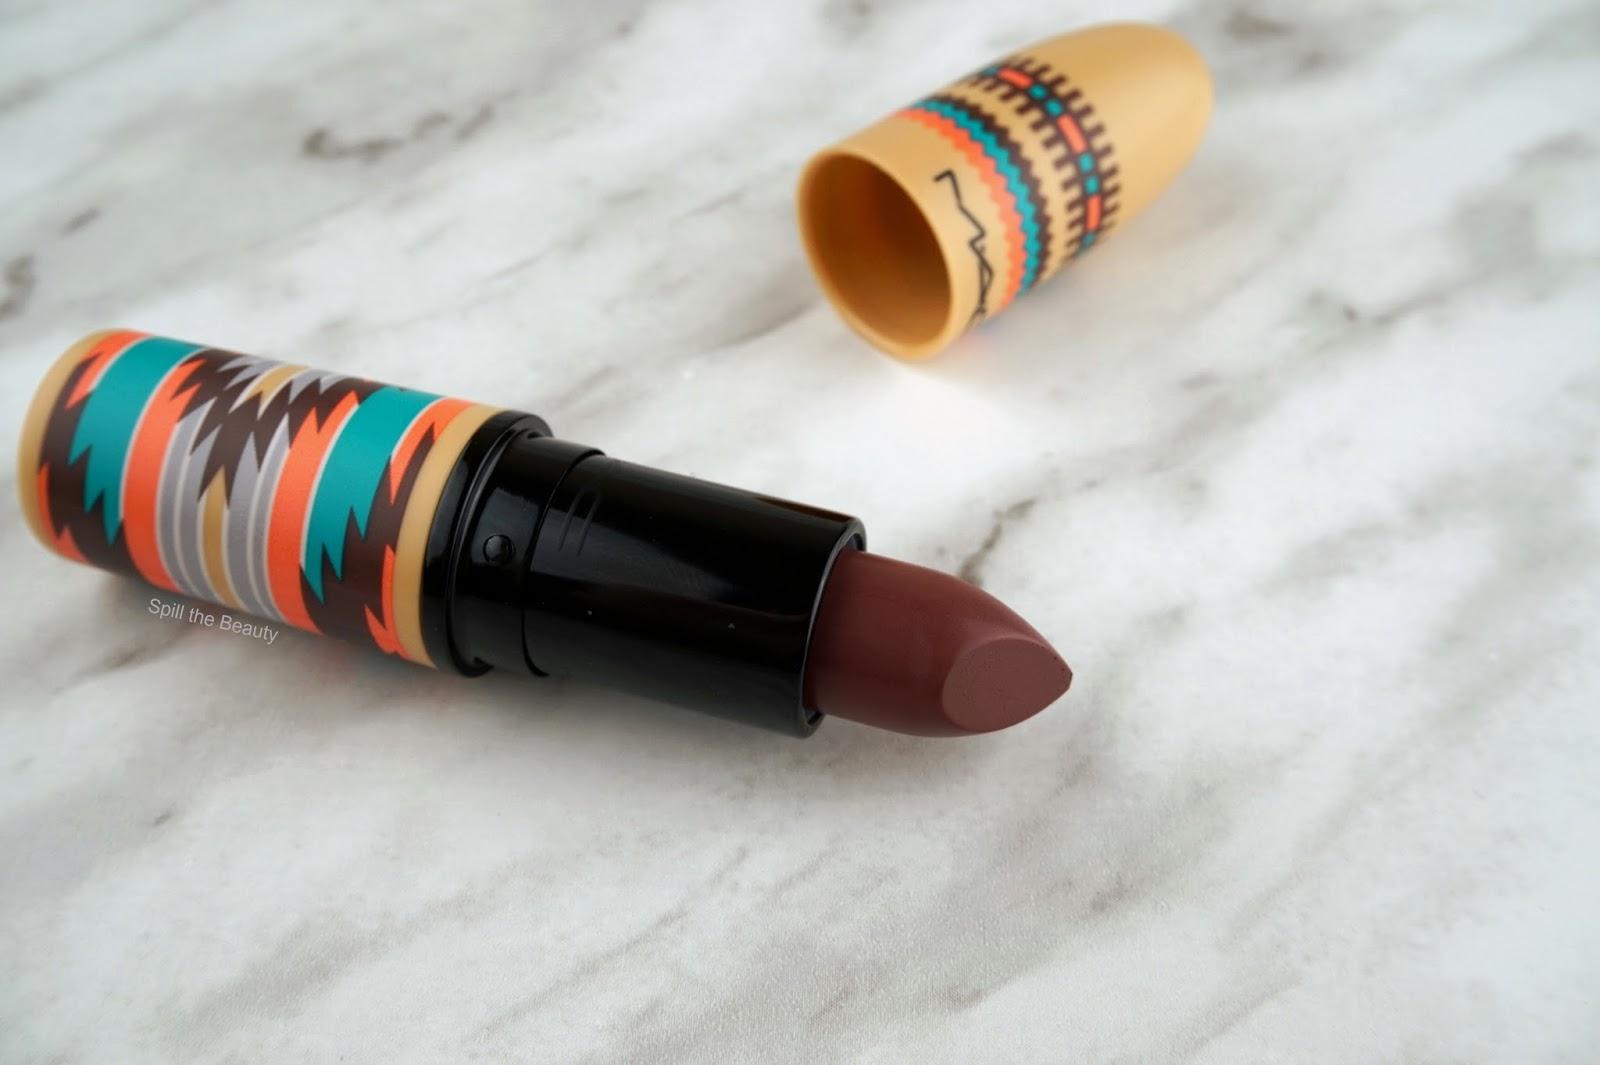 mac lipstick hot chocolate 2016